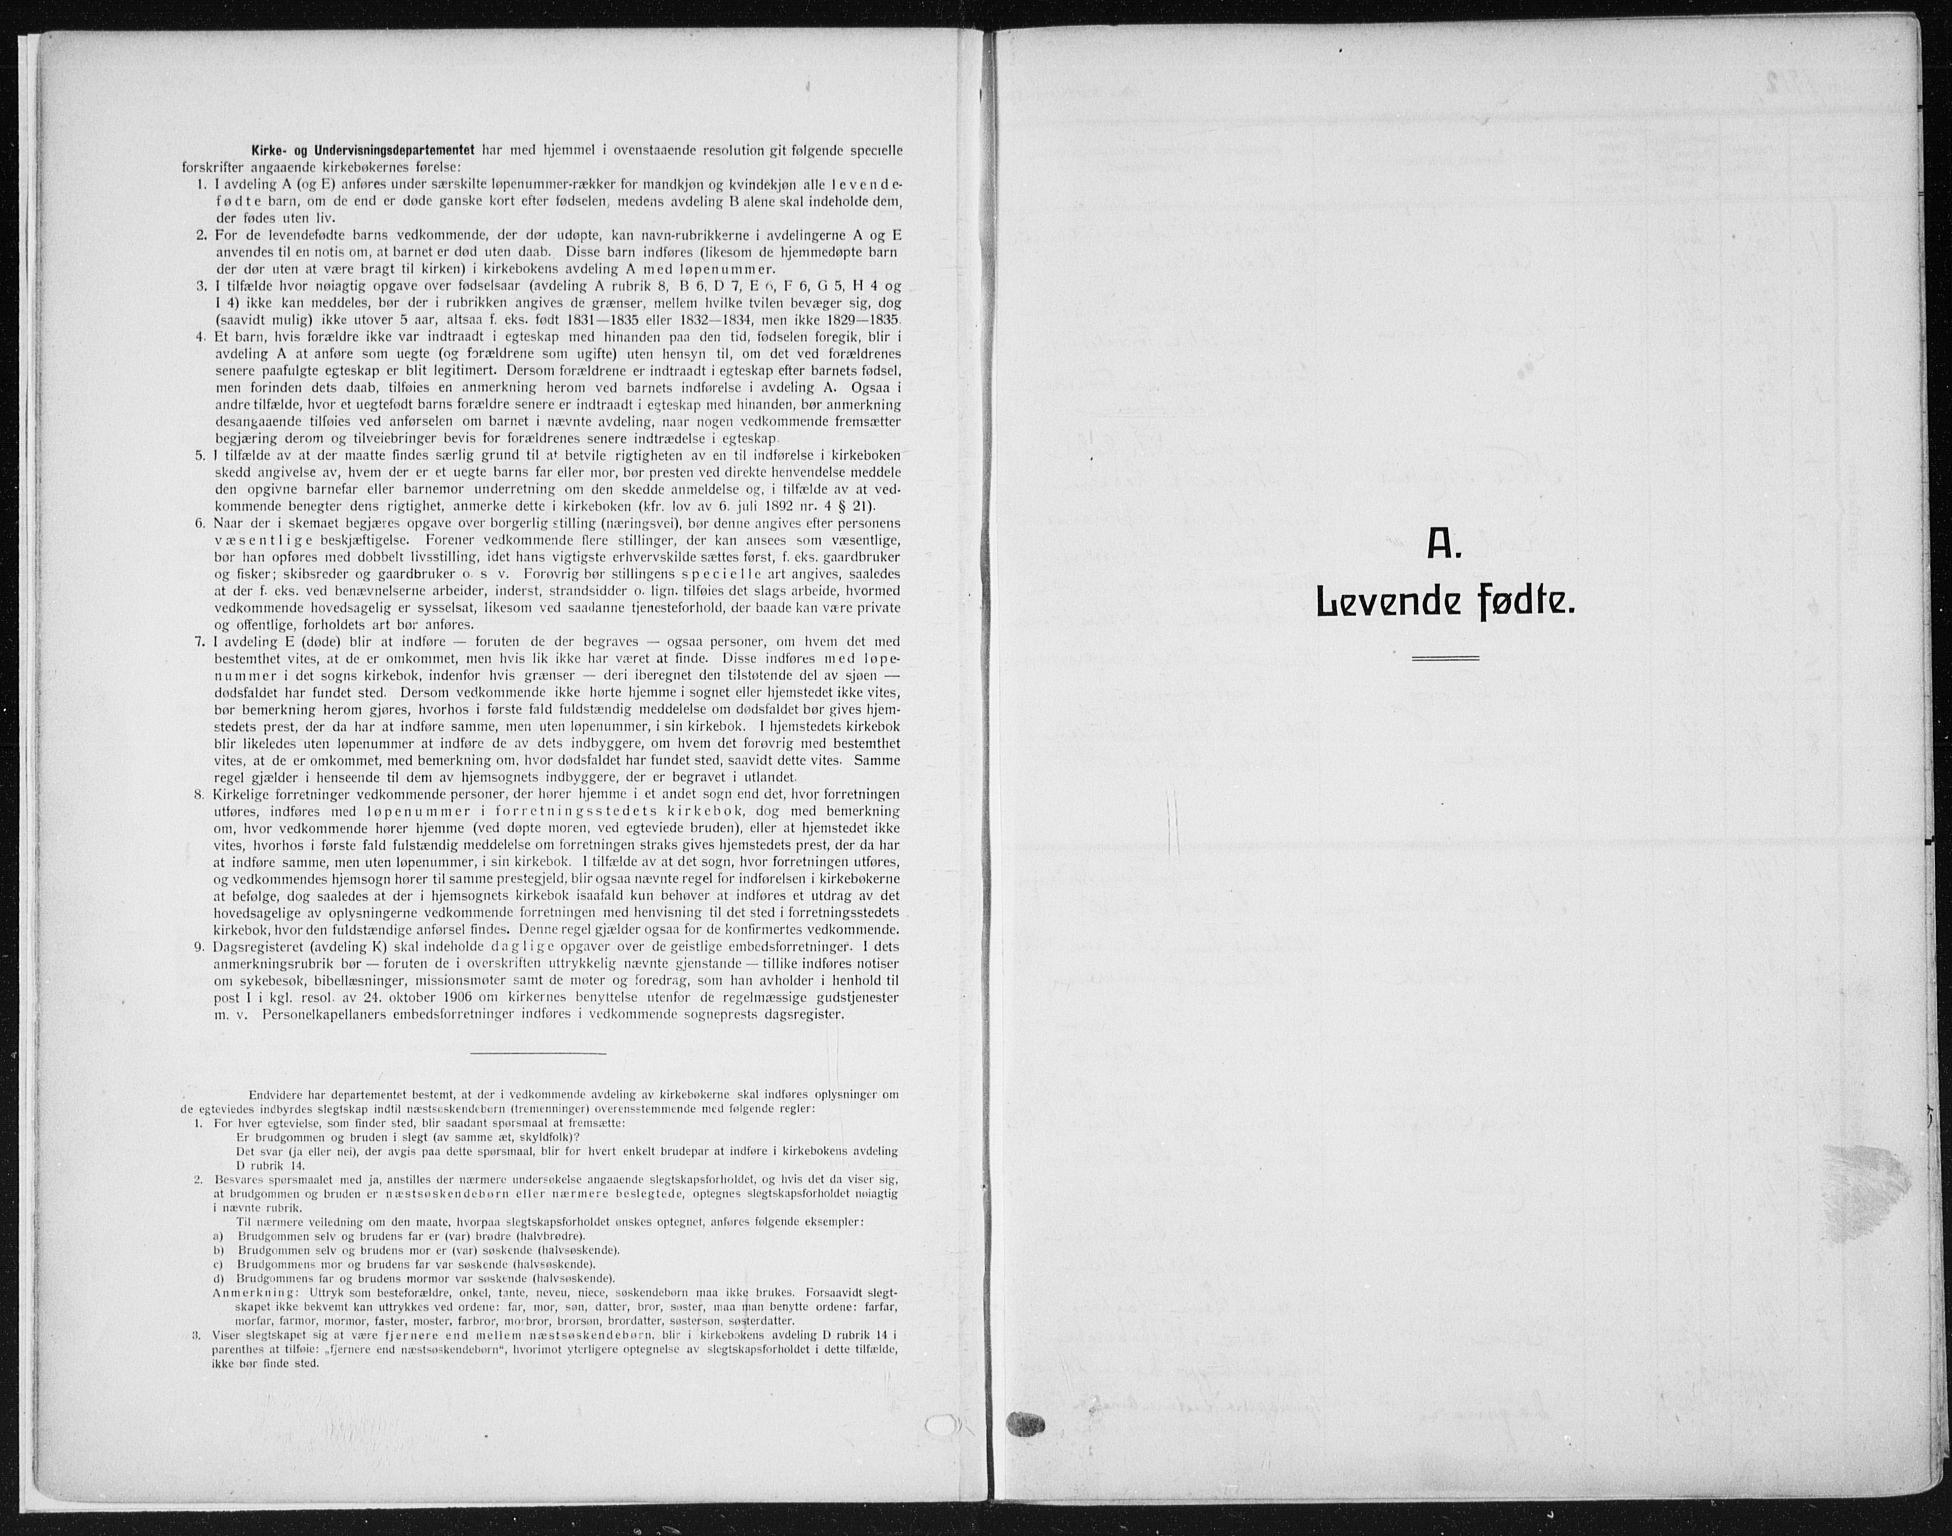 SAH, Vardal prestekontor, H/Ha/Haa/L0014: Ministerialbok nr. 14, 1912-1922